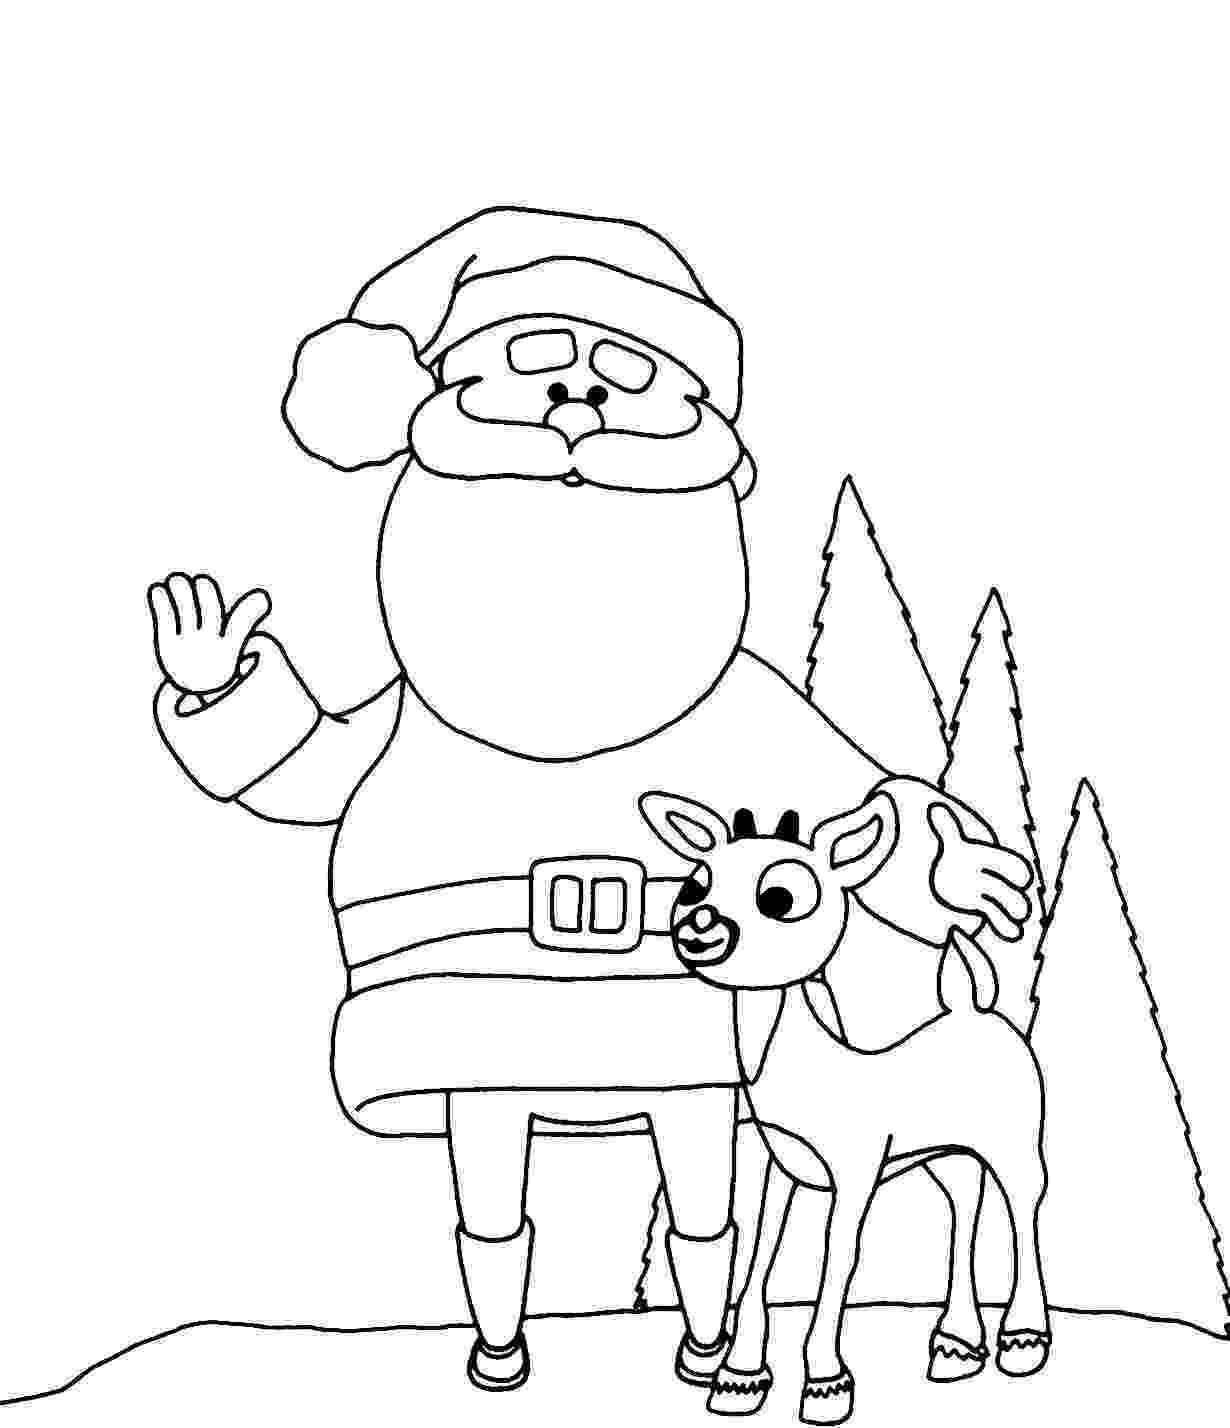 santa claus color yucca flats nm wenchkin39s coloring pages rankin bass claus color santa